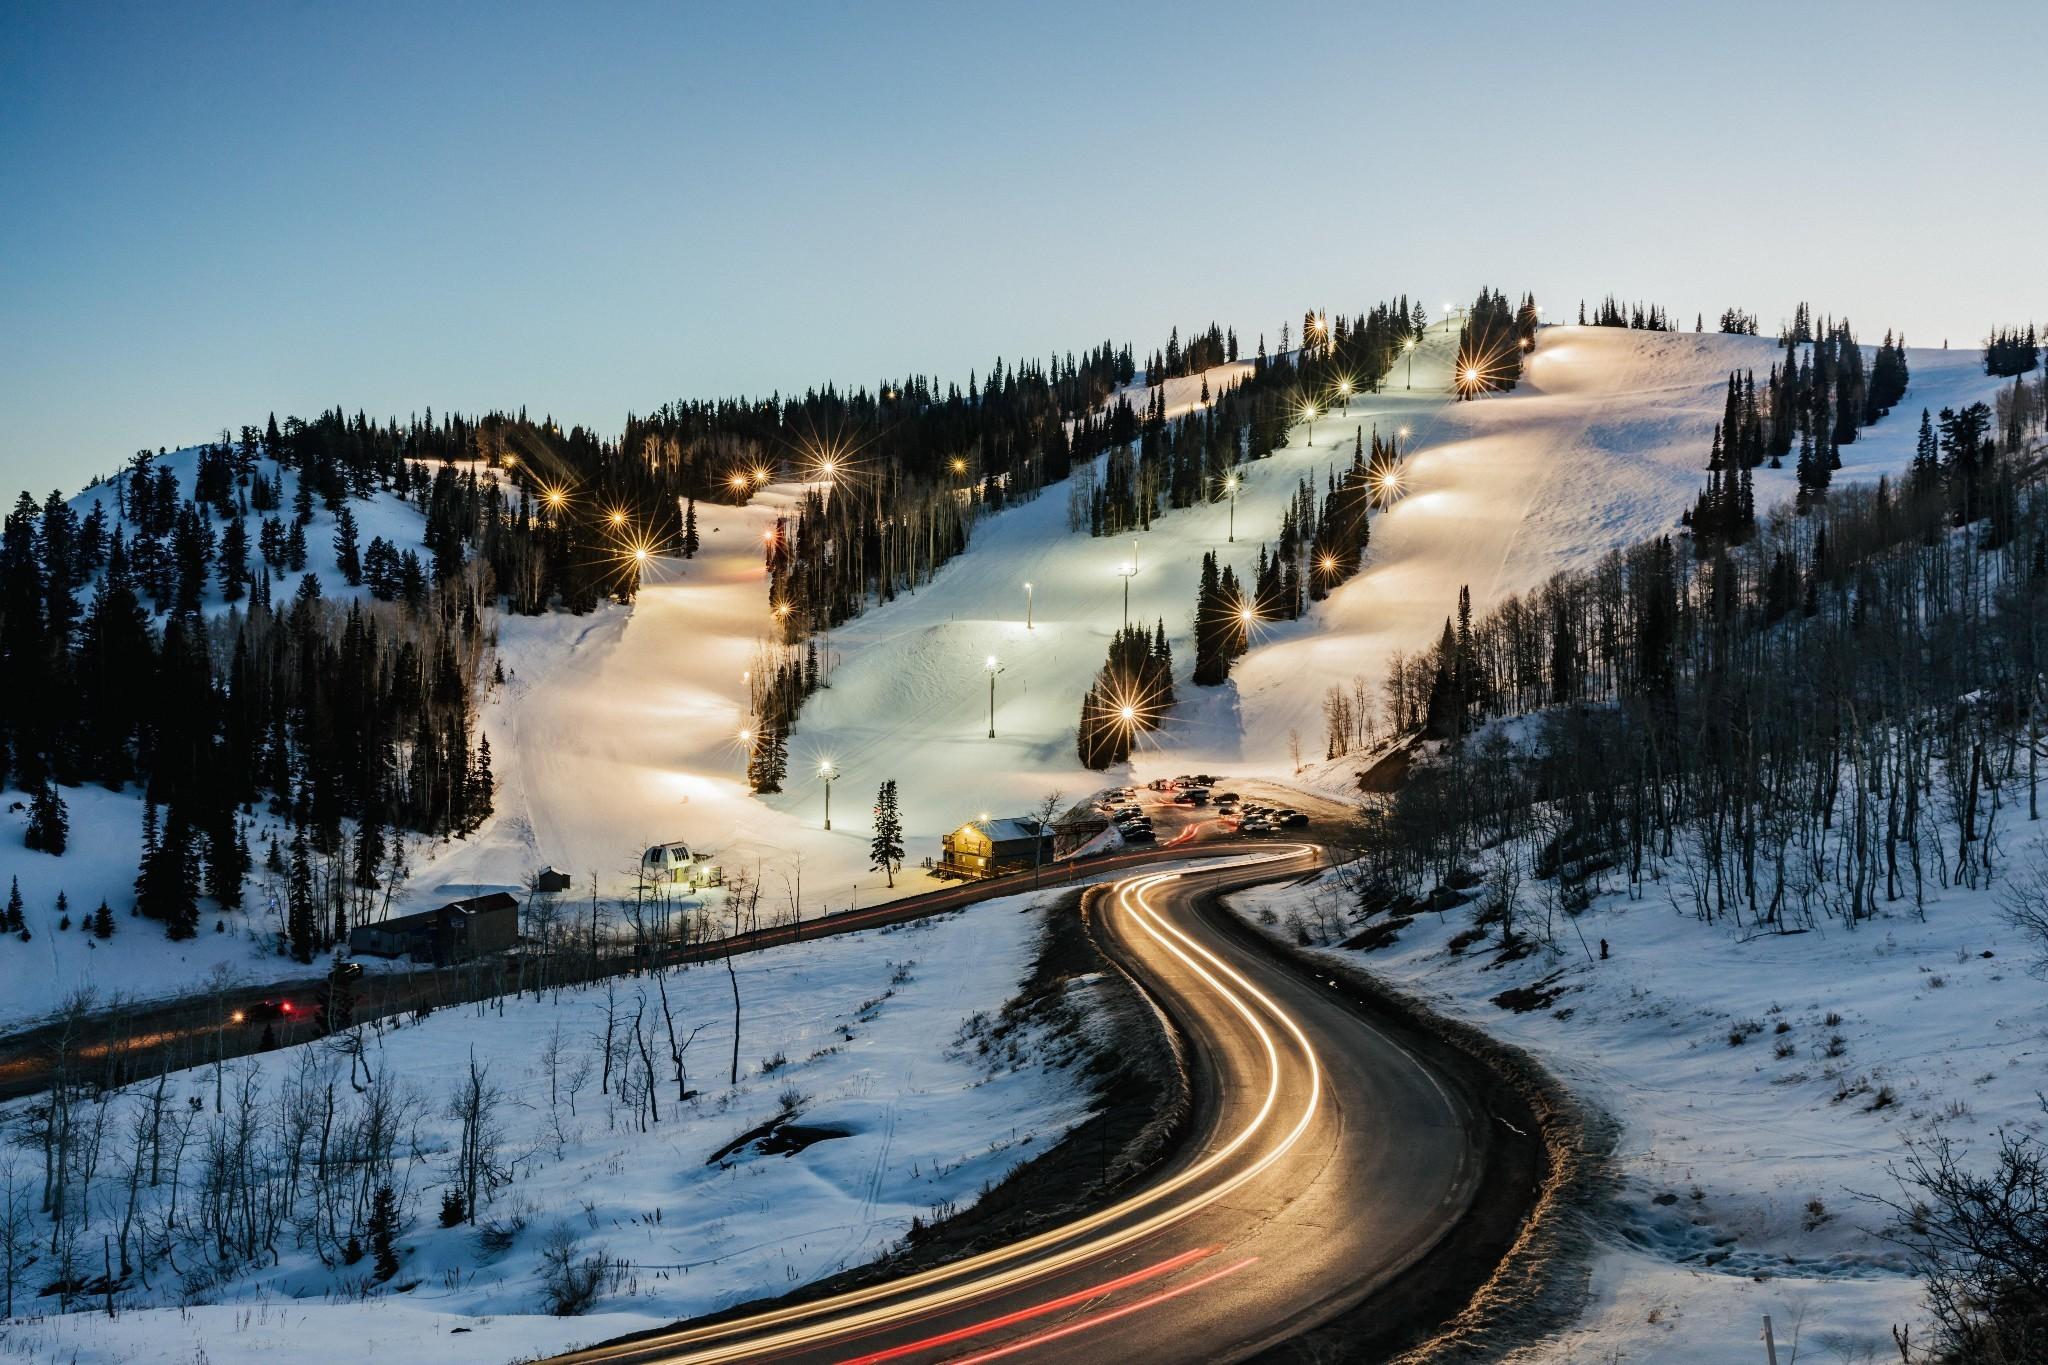 Welcome to Powder Mountain – a utopian club for the millennial elite